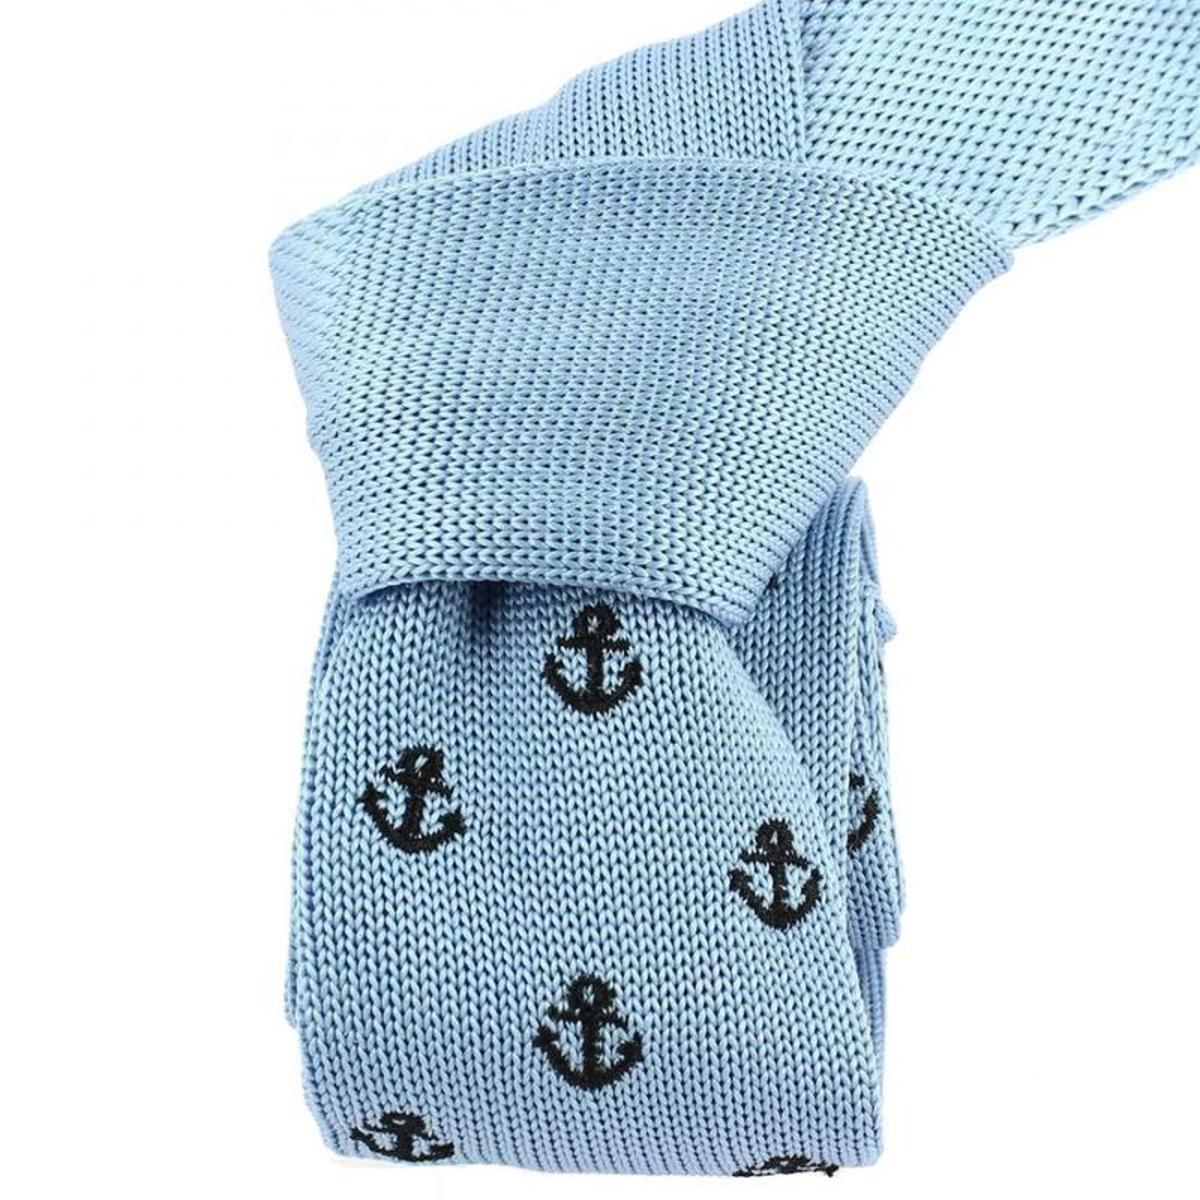 Cravate tricot  ancre bleu